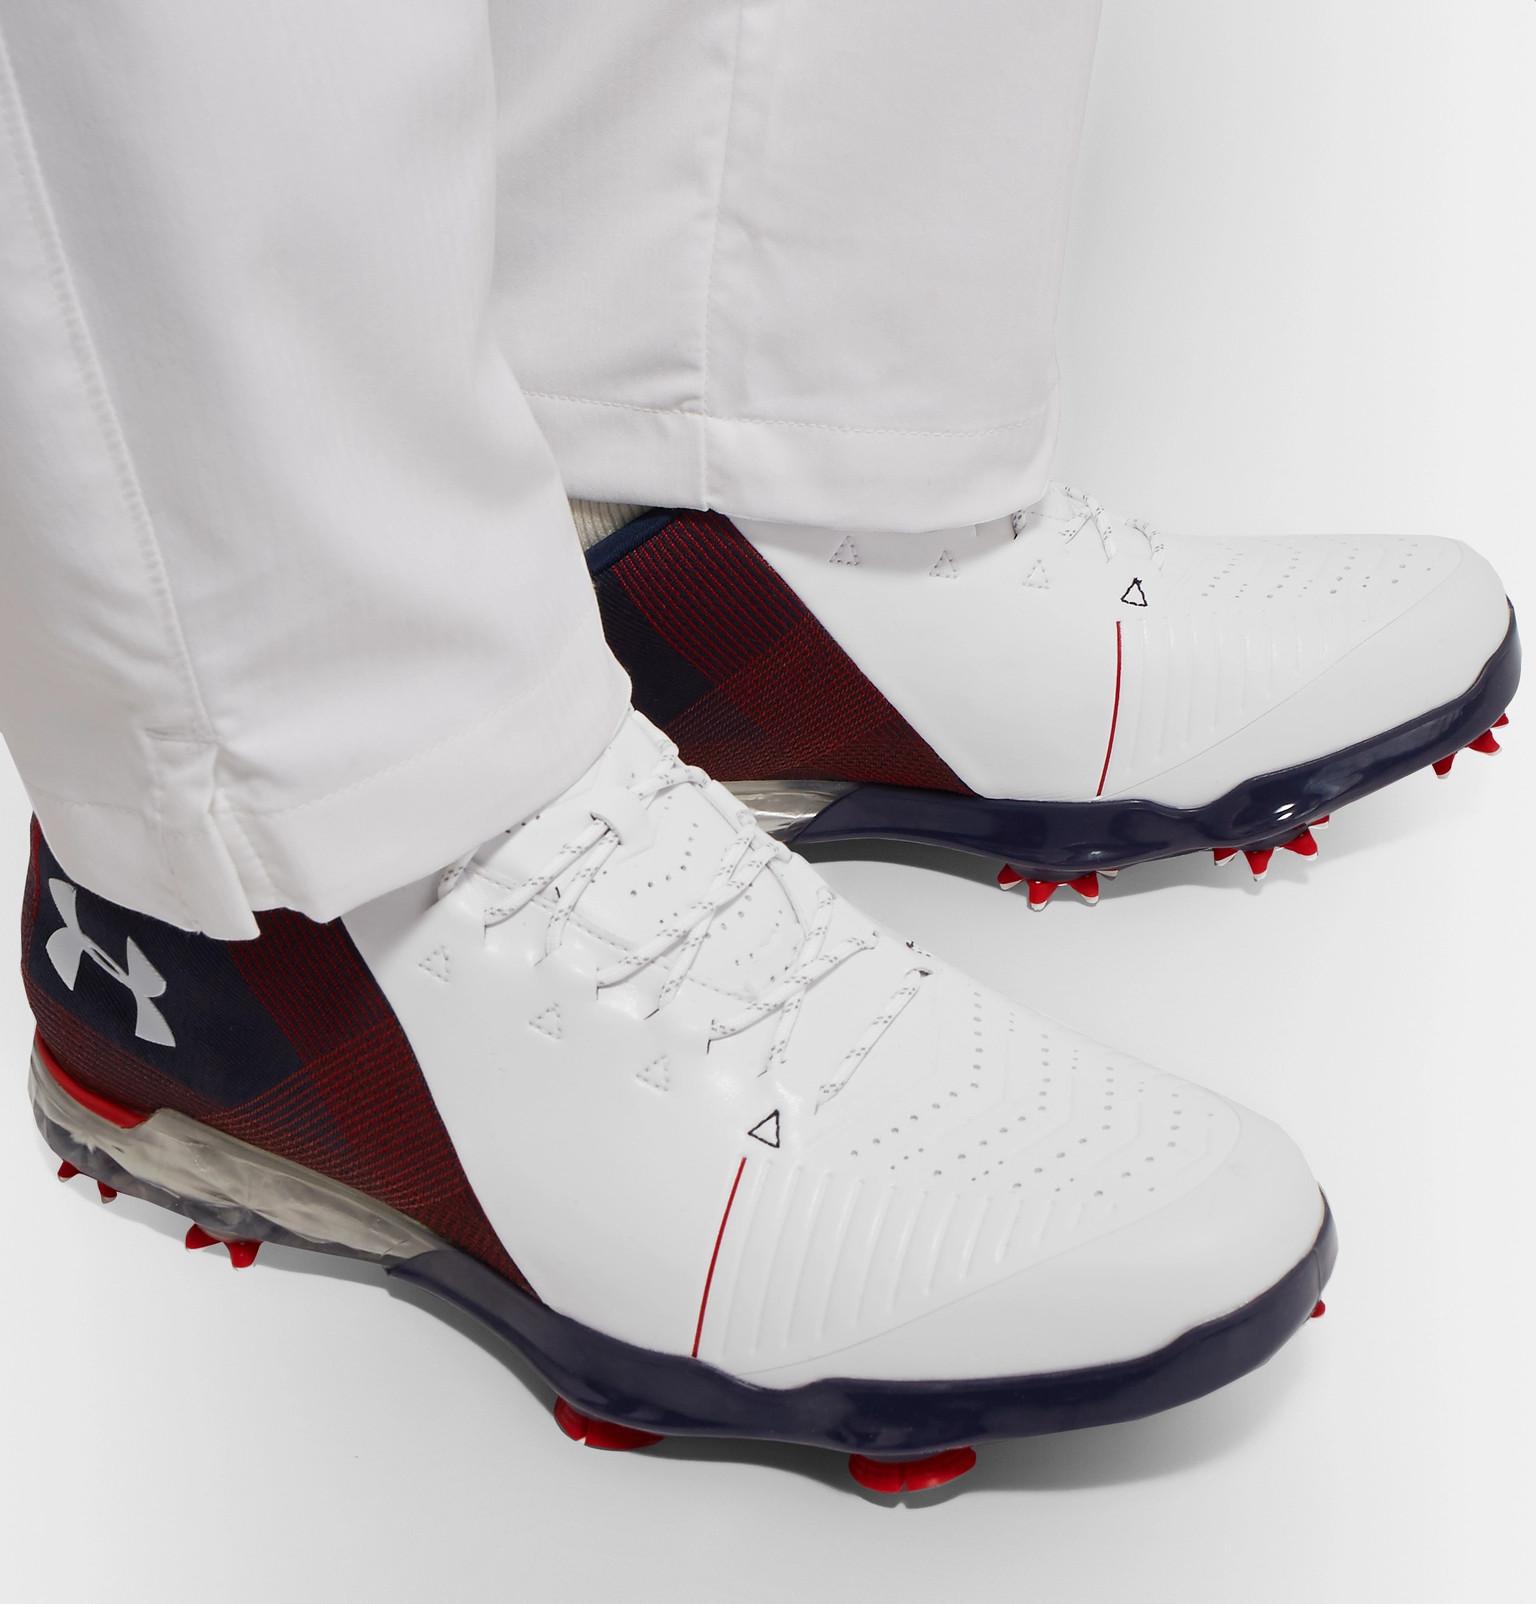 7959901f160 Under Armour - Spieth 2 GORE-TEX Golf Shoes